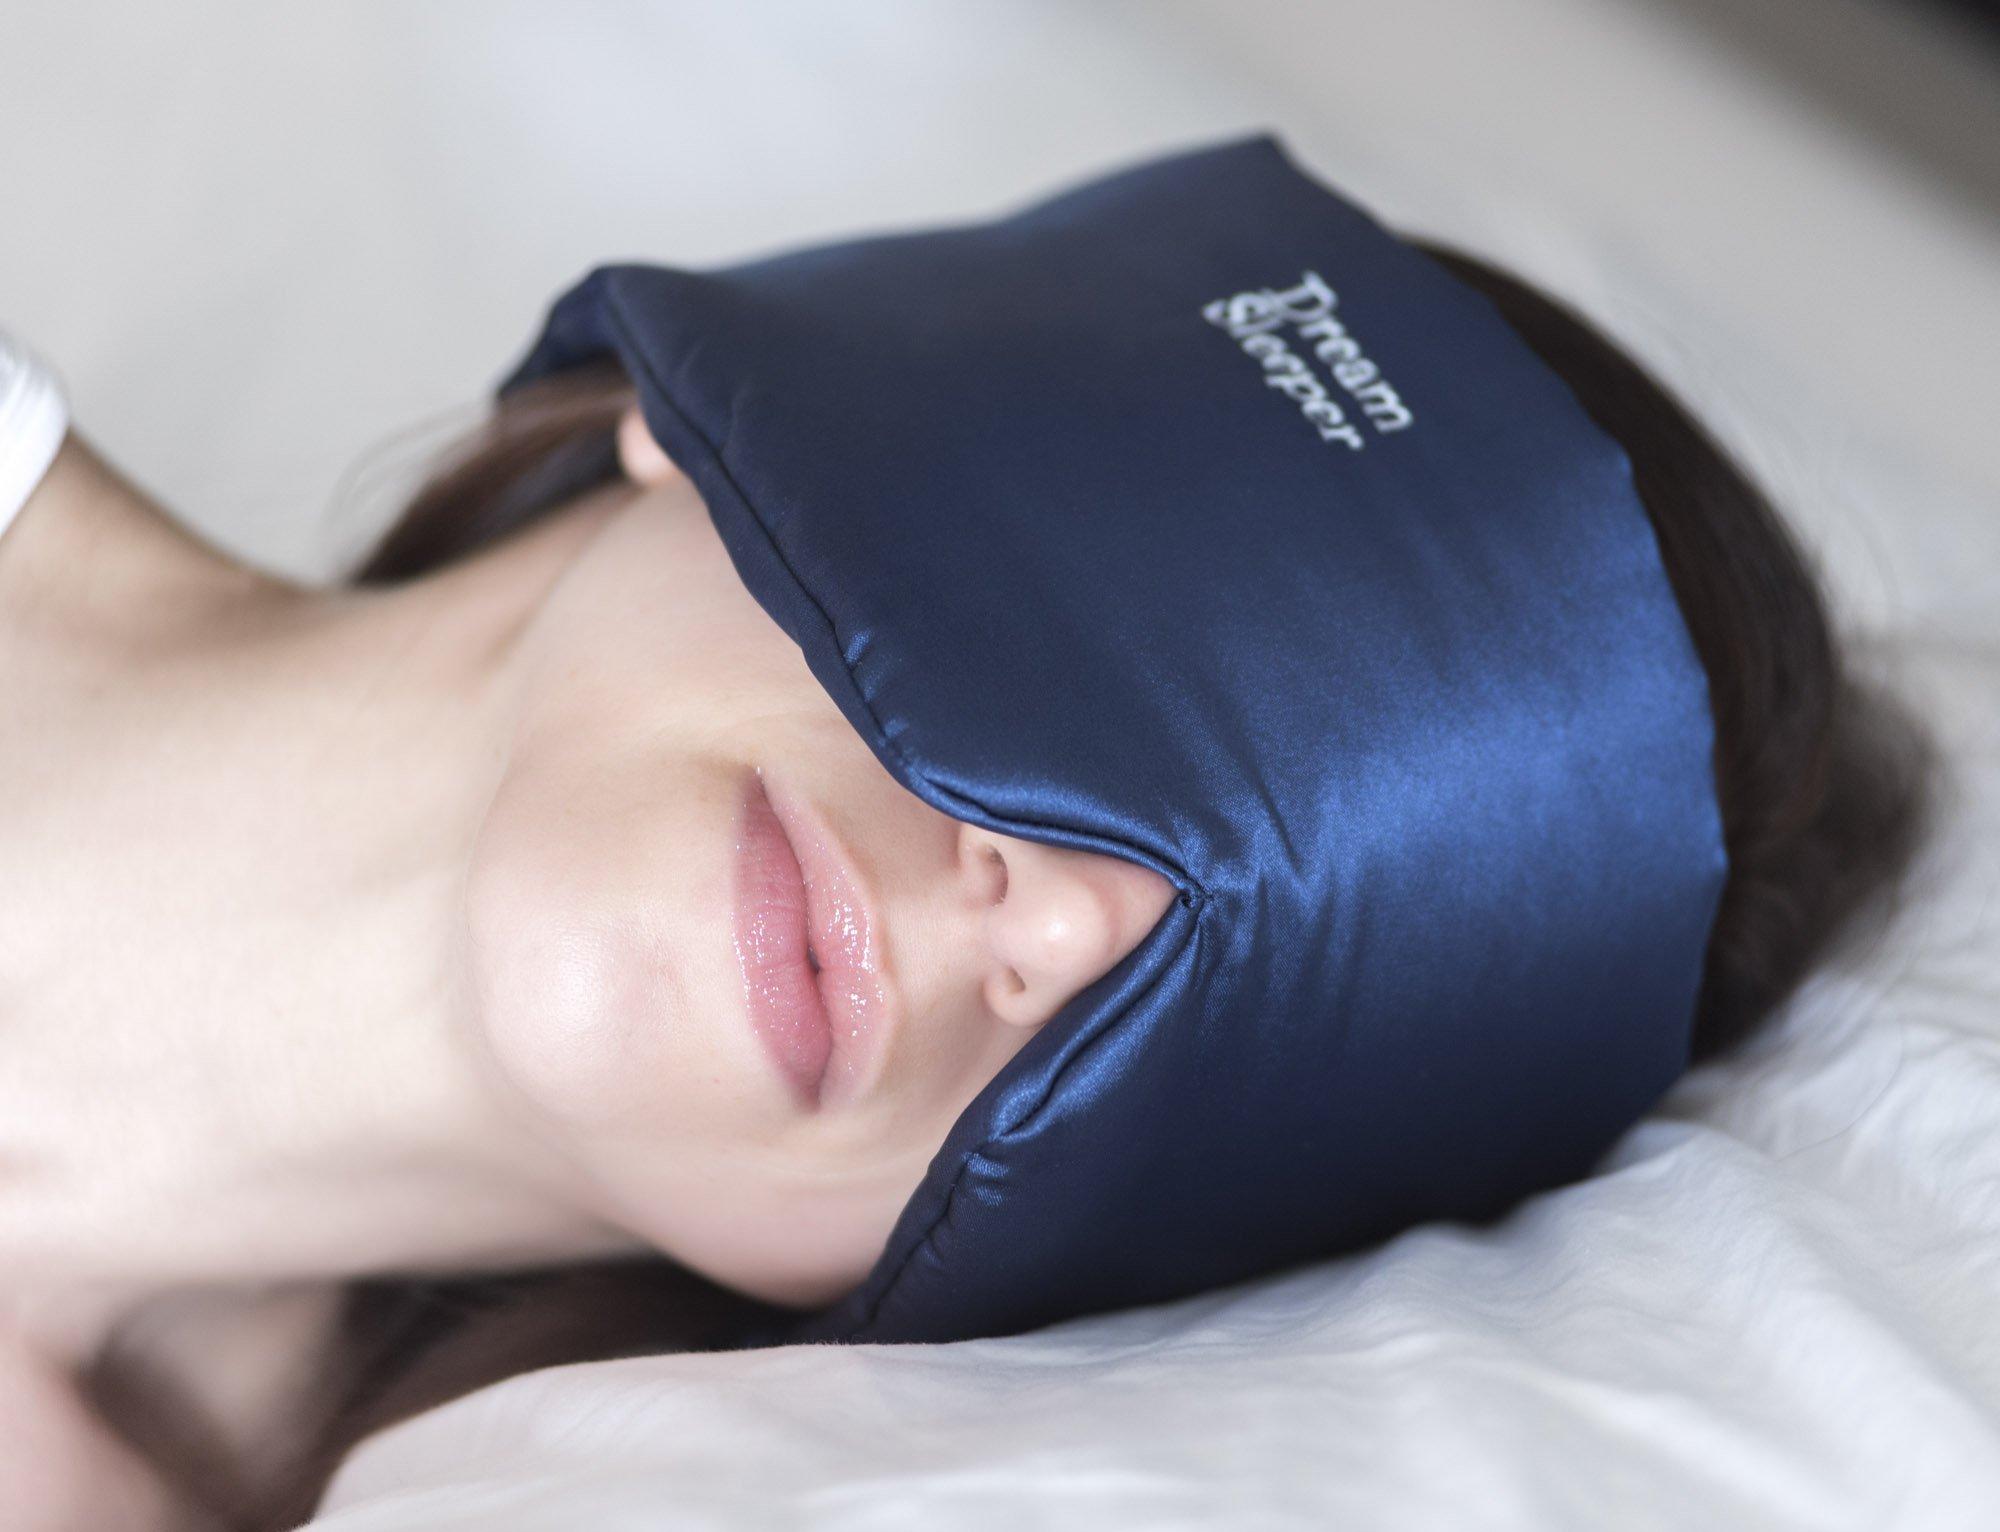 Sleep Mask Best Sleeping Eye Mask for Women Men Navy Silk with Velcro Strap Yoga/Travel Blackout Shades Lifetime Replacement Assurance. by Dream Sleeper